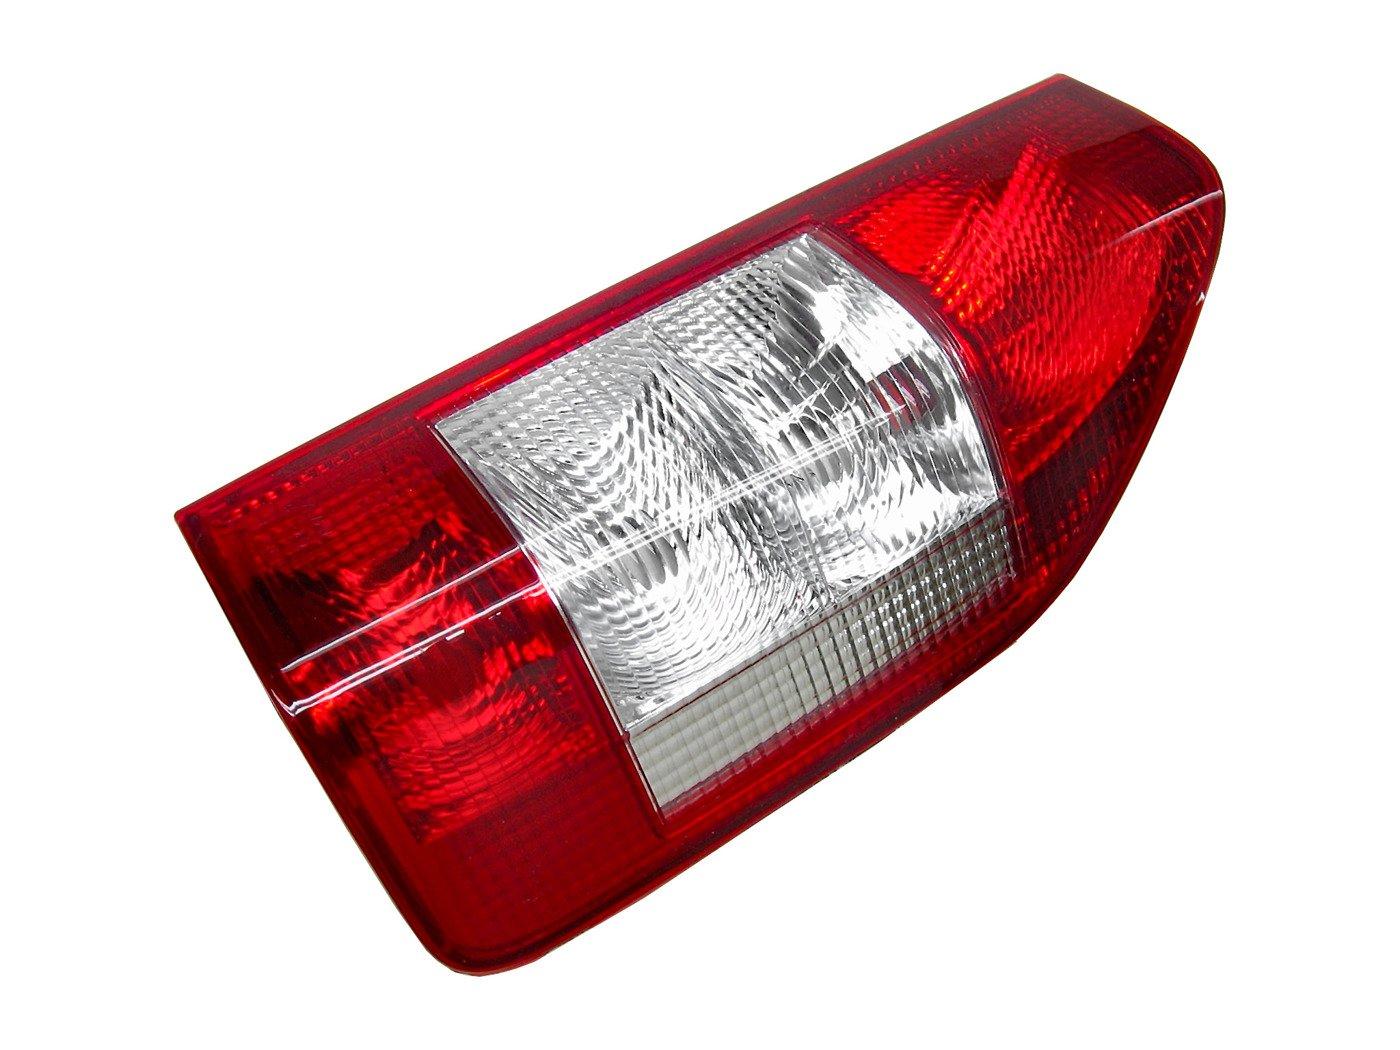 Lampy Tylne Lewa I Prawa Mercedes Sprinter 1995 2006